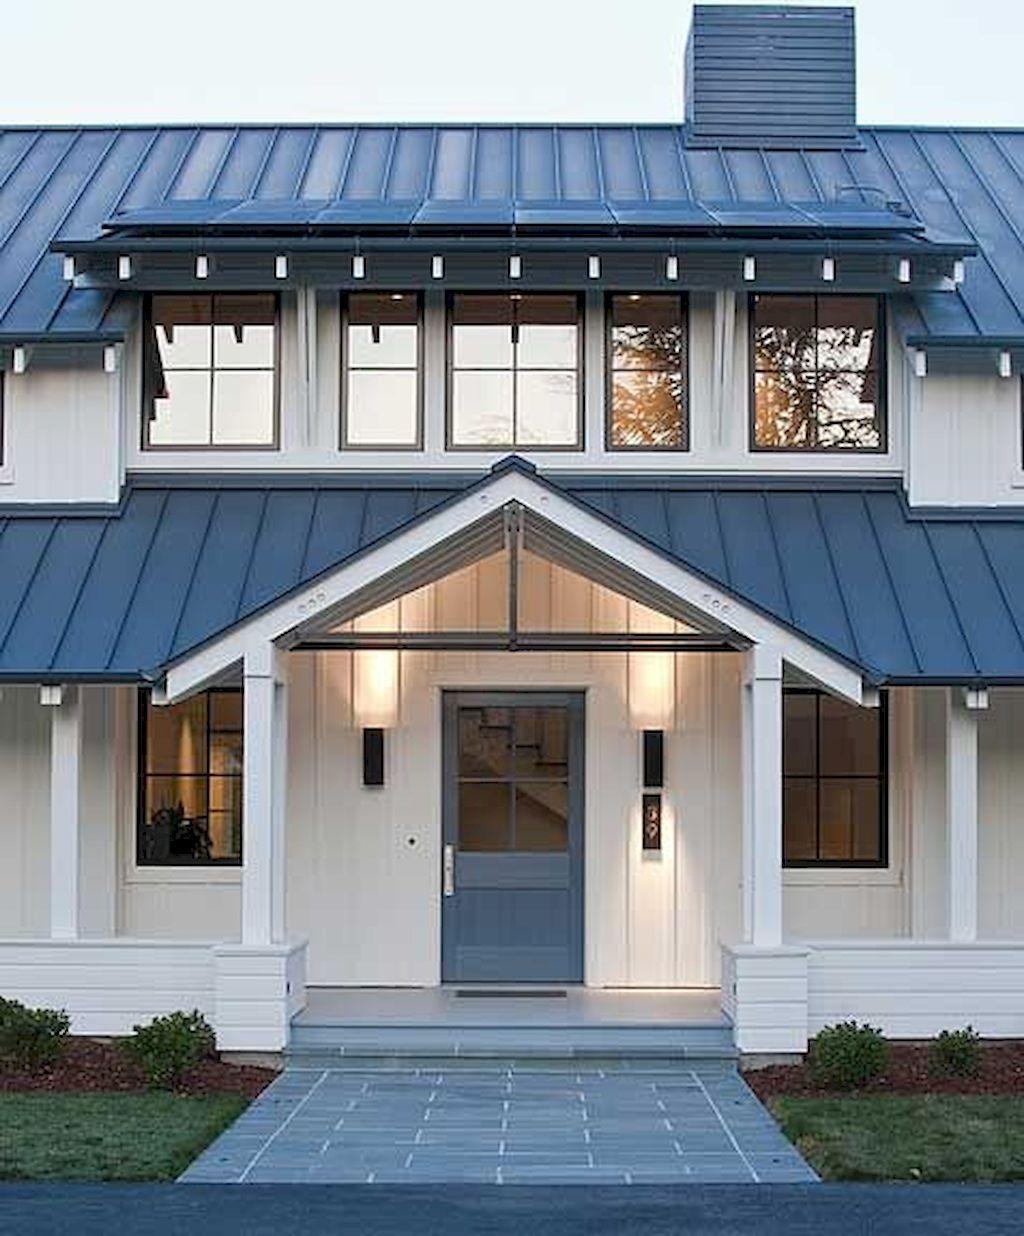 35 Stunning Modern Farmhouse Exterior Design Ideas Modern Farmhouse Exterior Modern Farmhouse Design Farmhouse Design